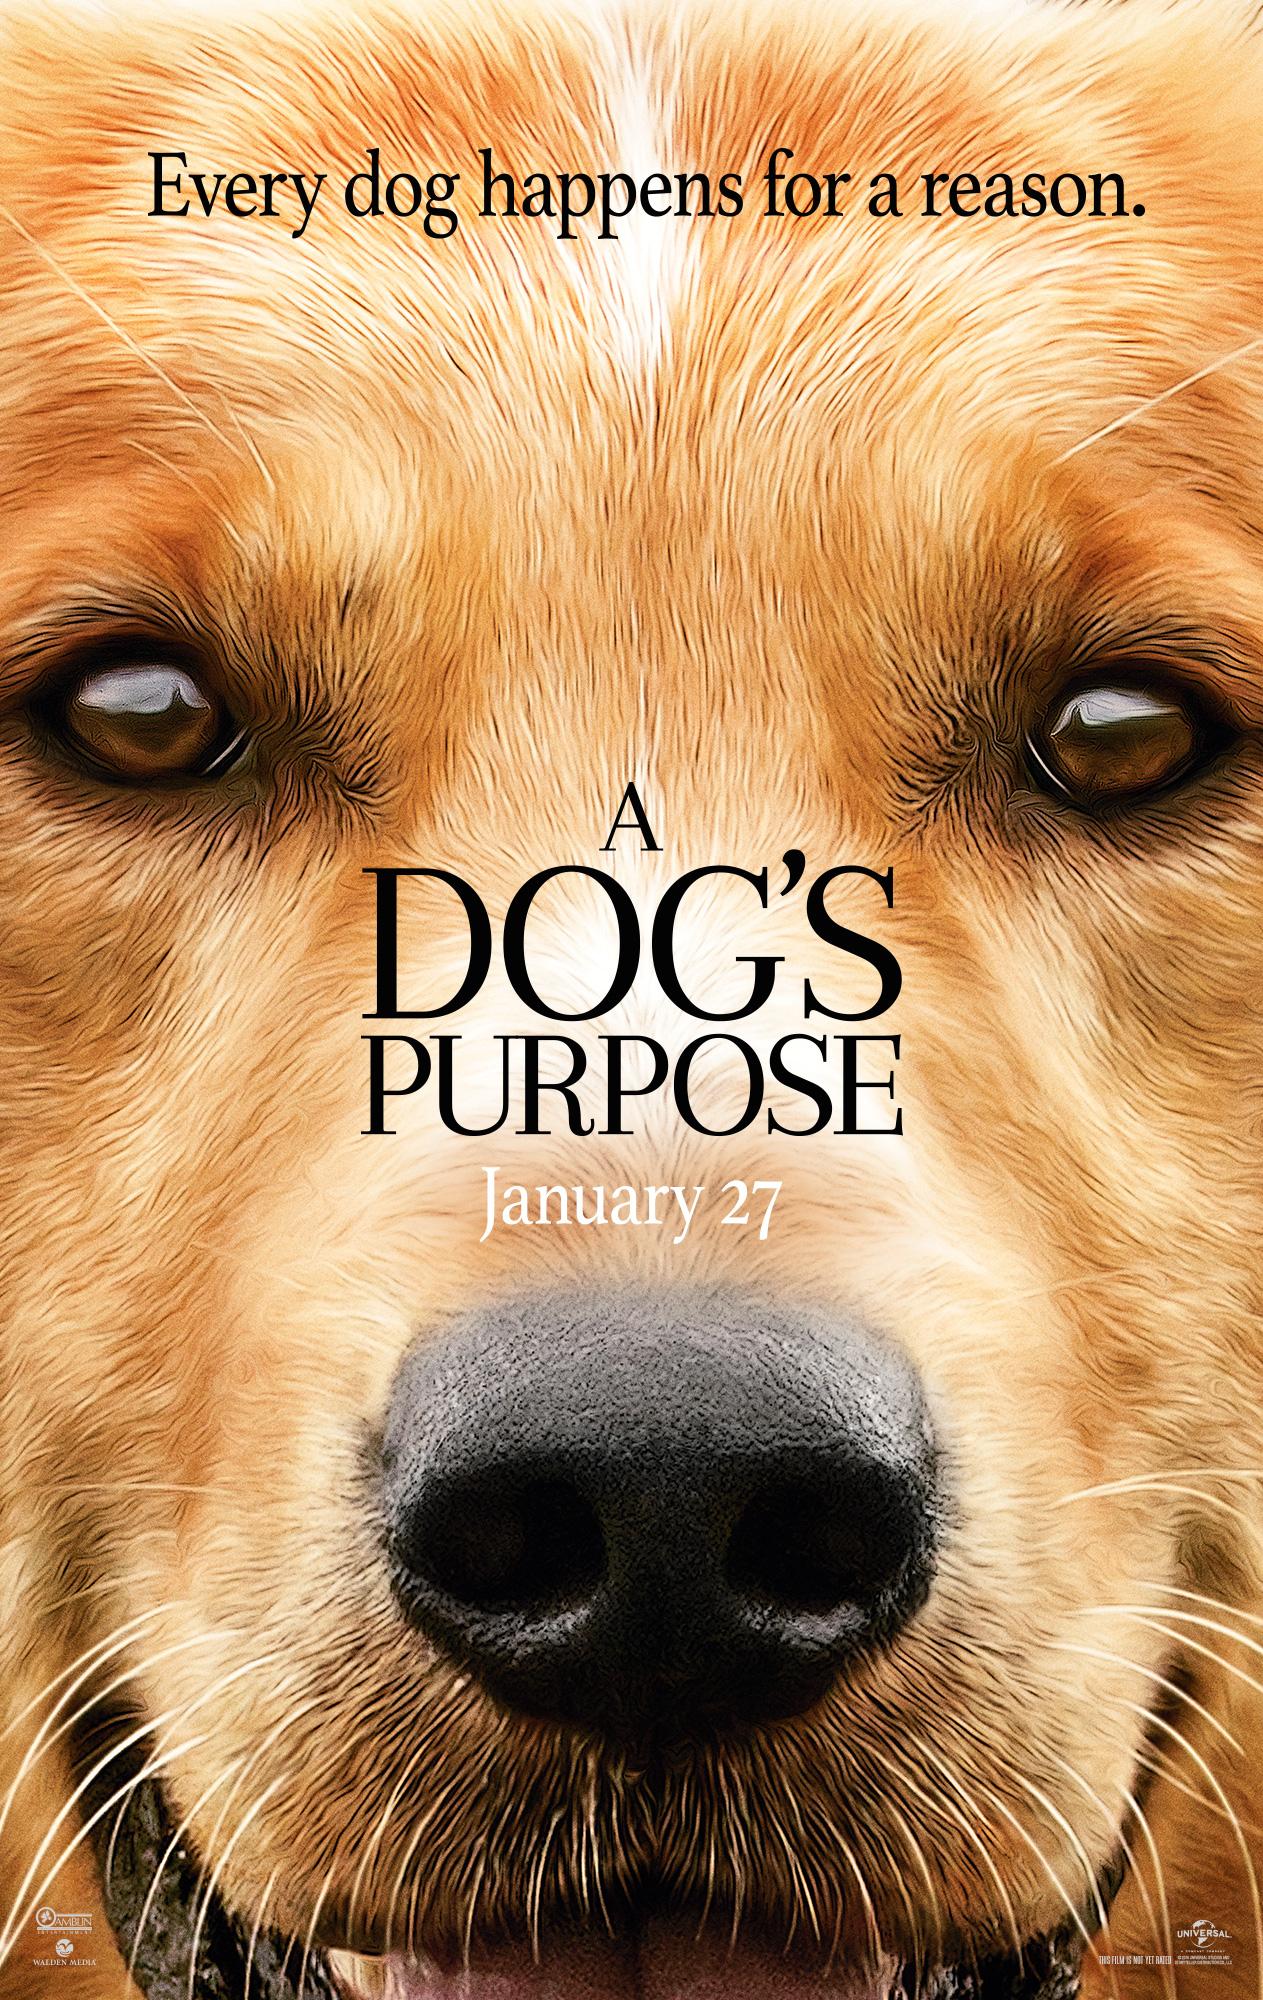 ADogsPurpose-Poster (1)